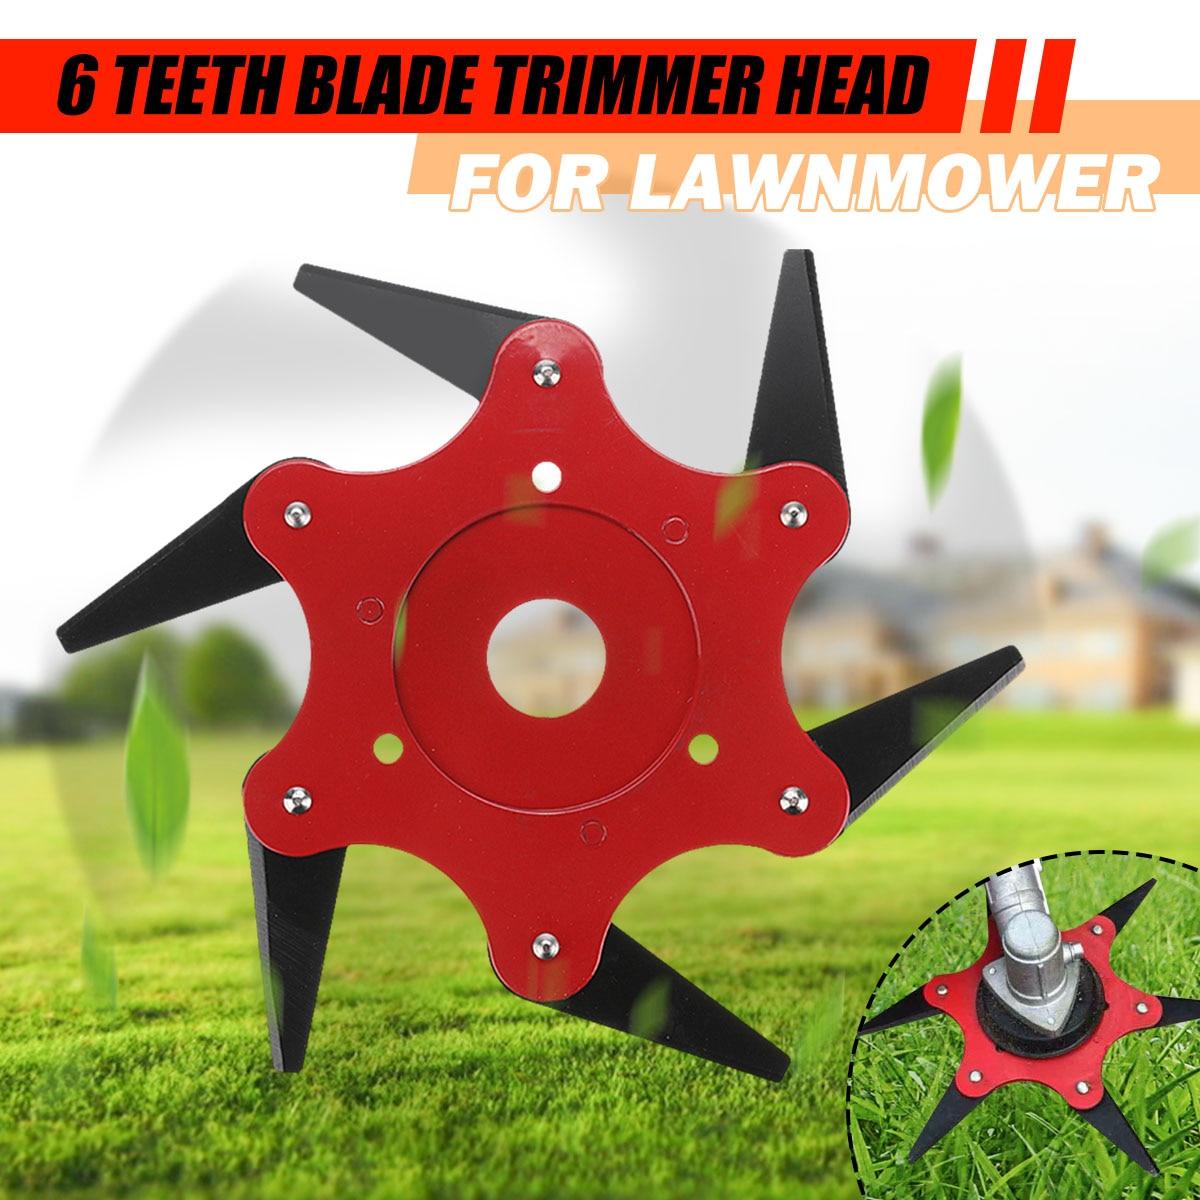 Updated Trimmer Head 65Mn 6 Teeths Blade Trimmer Head Brush Cutter Blade For Lawnmower